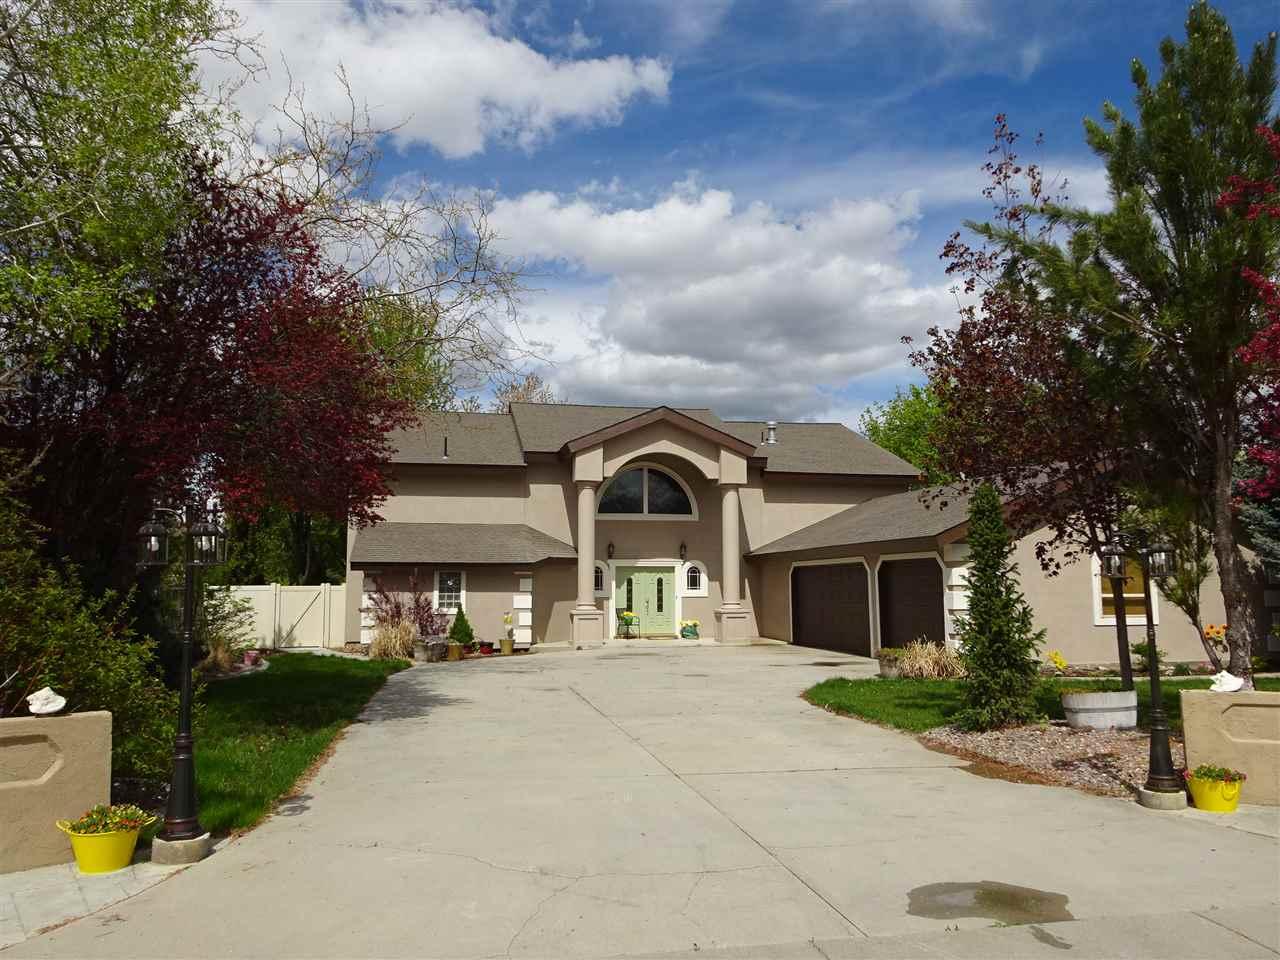 3452 S Riva Ridge Way, Boise, ID 83709